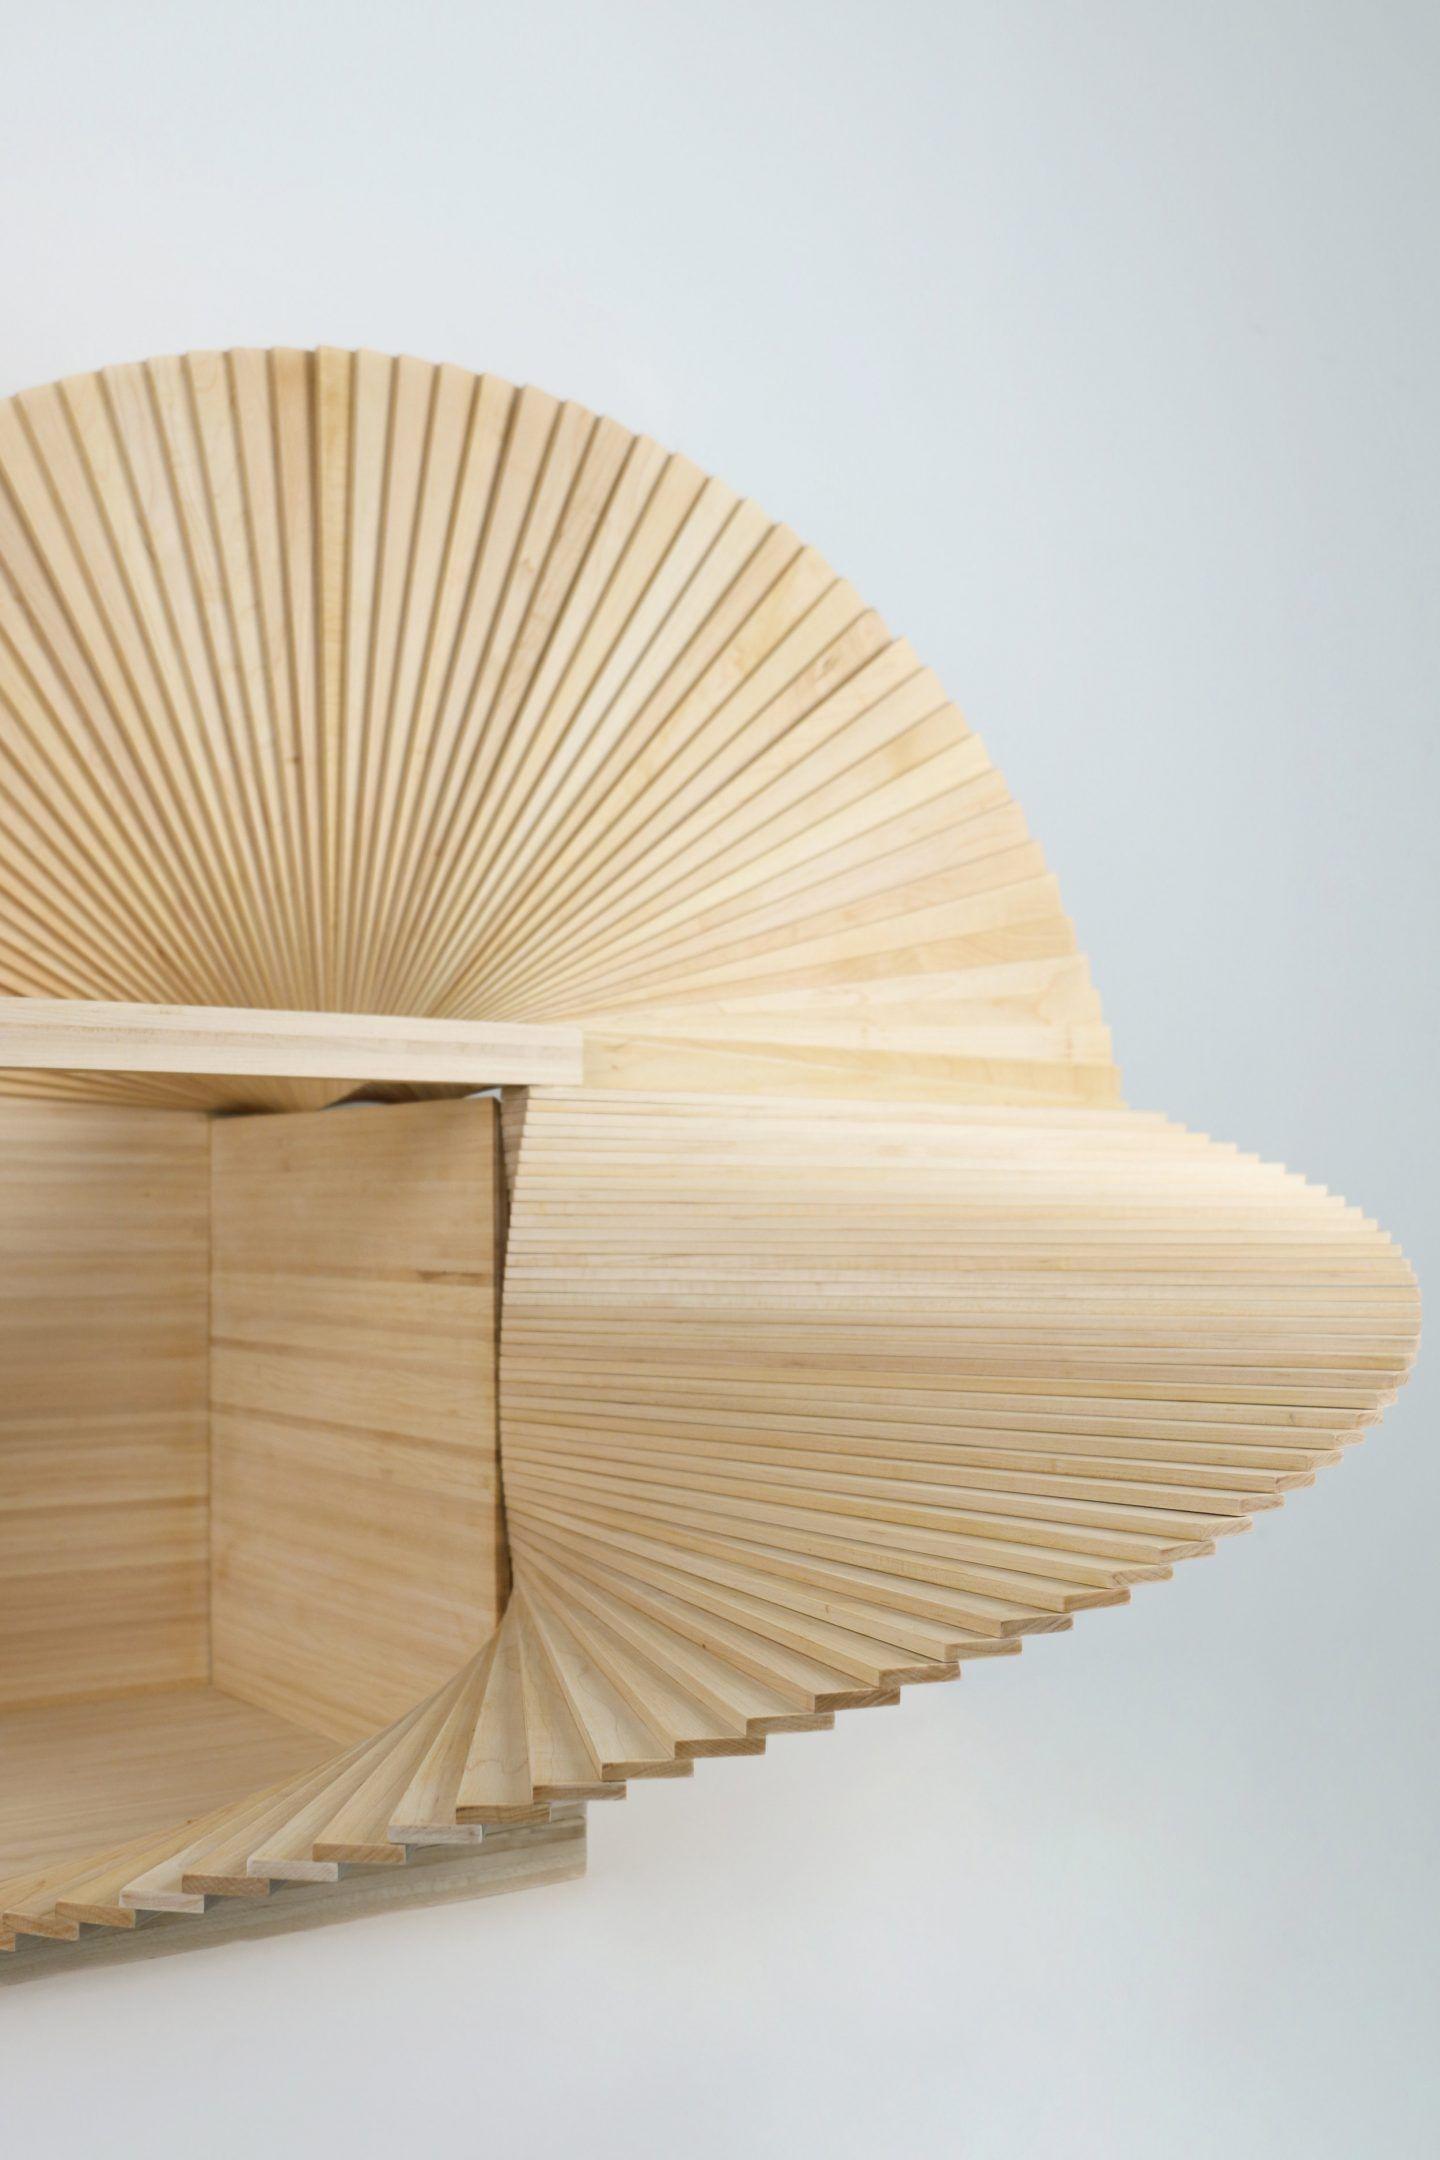 IGNANT-Design-Sebastian-Errazuriz-Cabinet-008